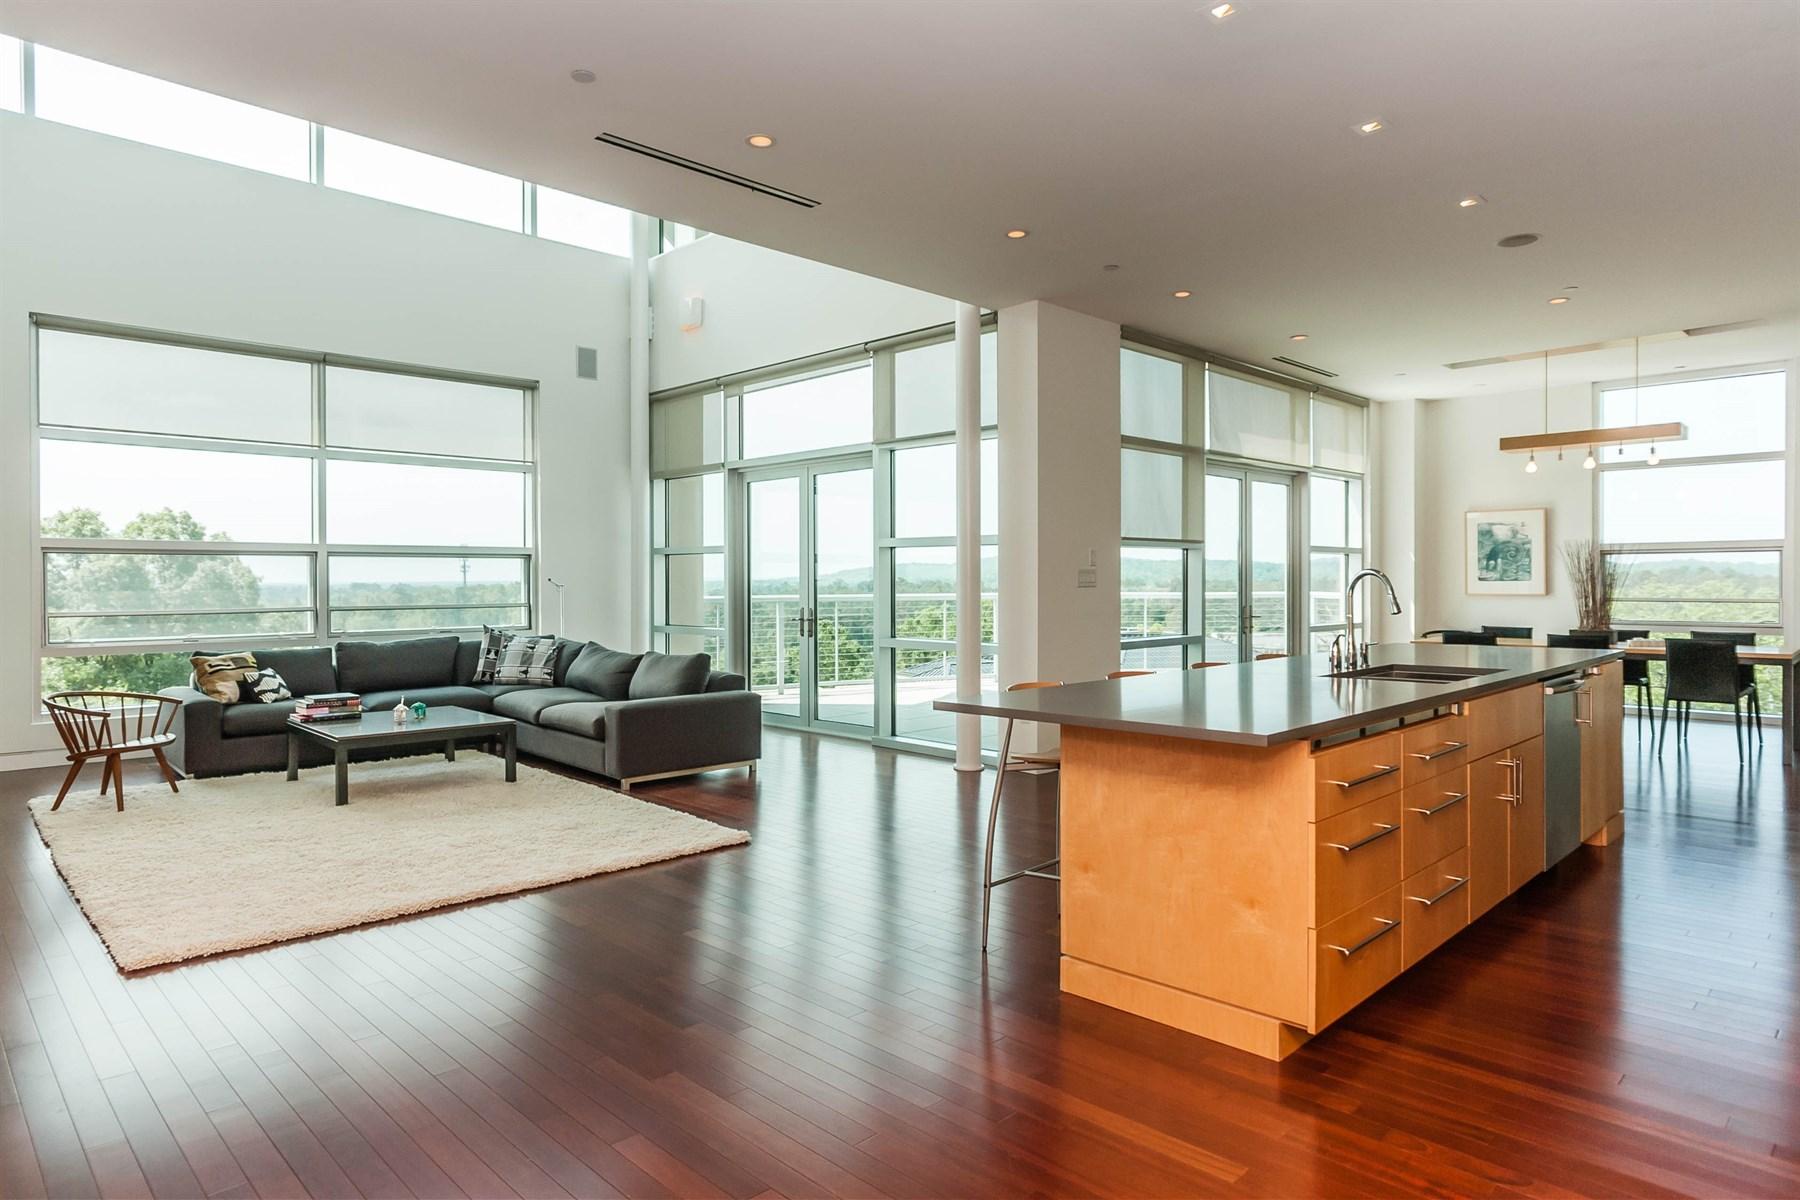 Condominium for Sale at Castalia Penthouse 331 W.Barbee Chapel Road Chapel Hill, North Carolina 27517 United States